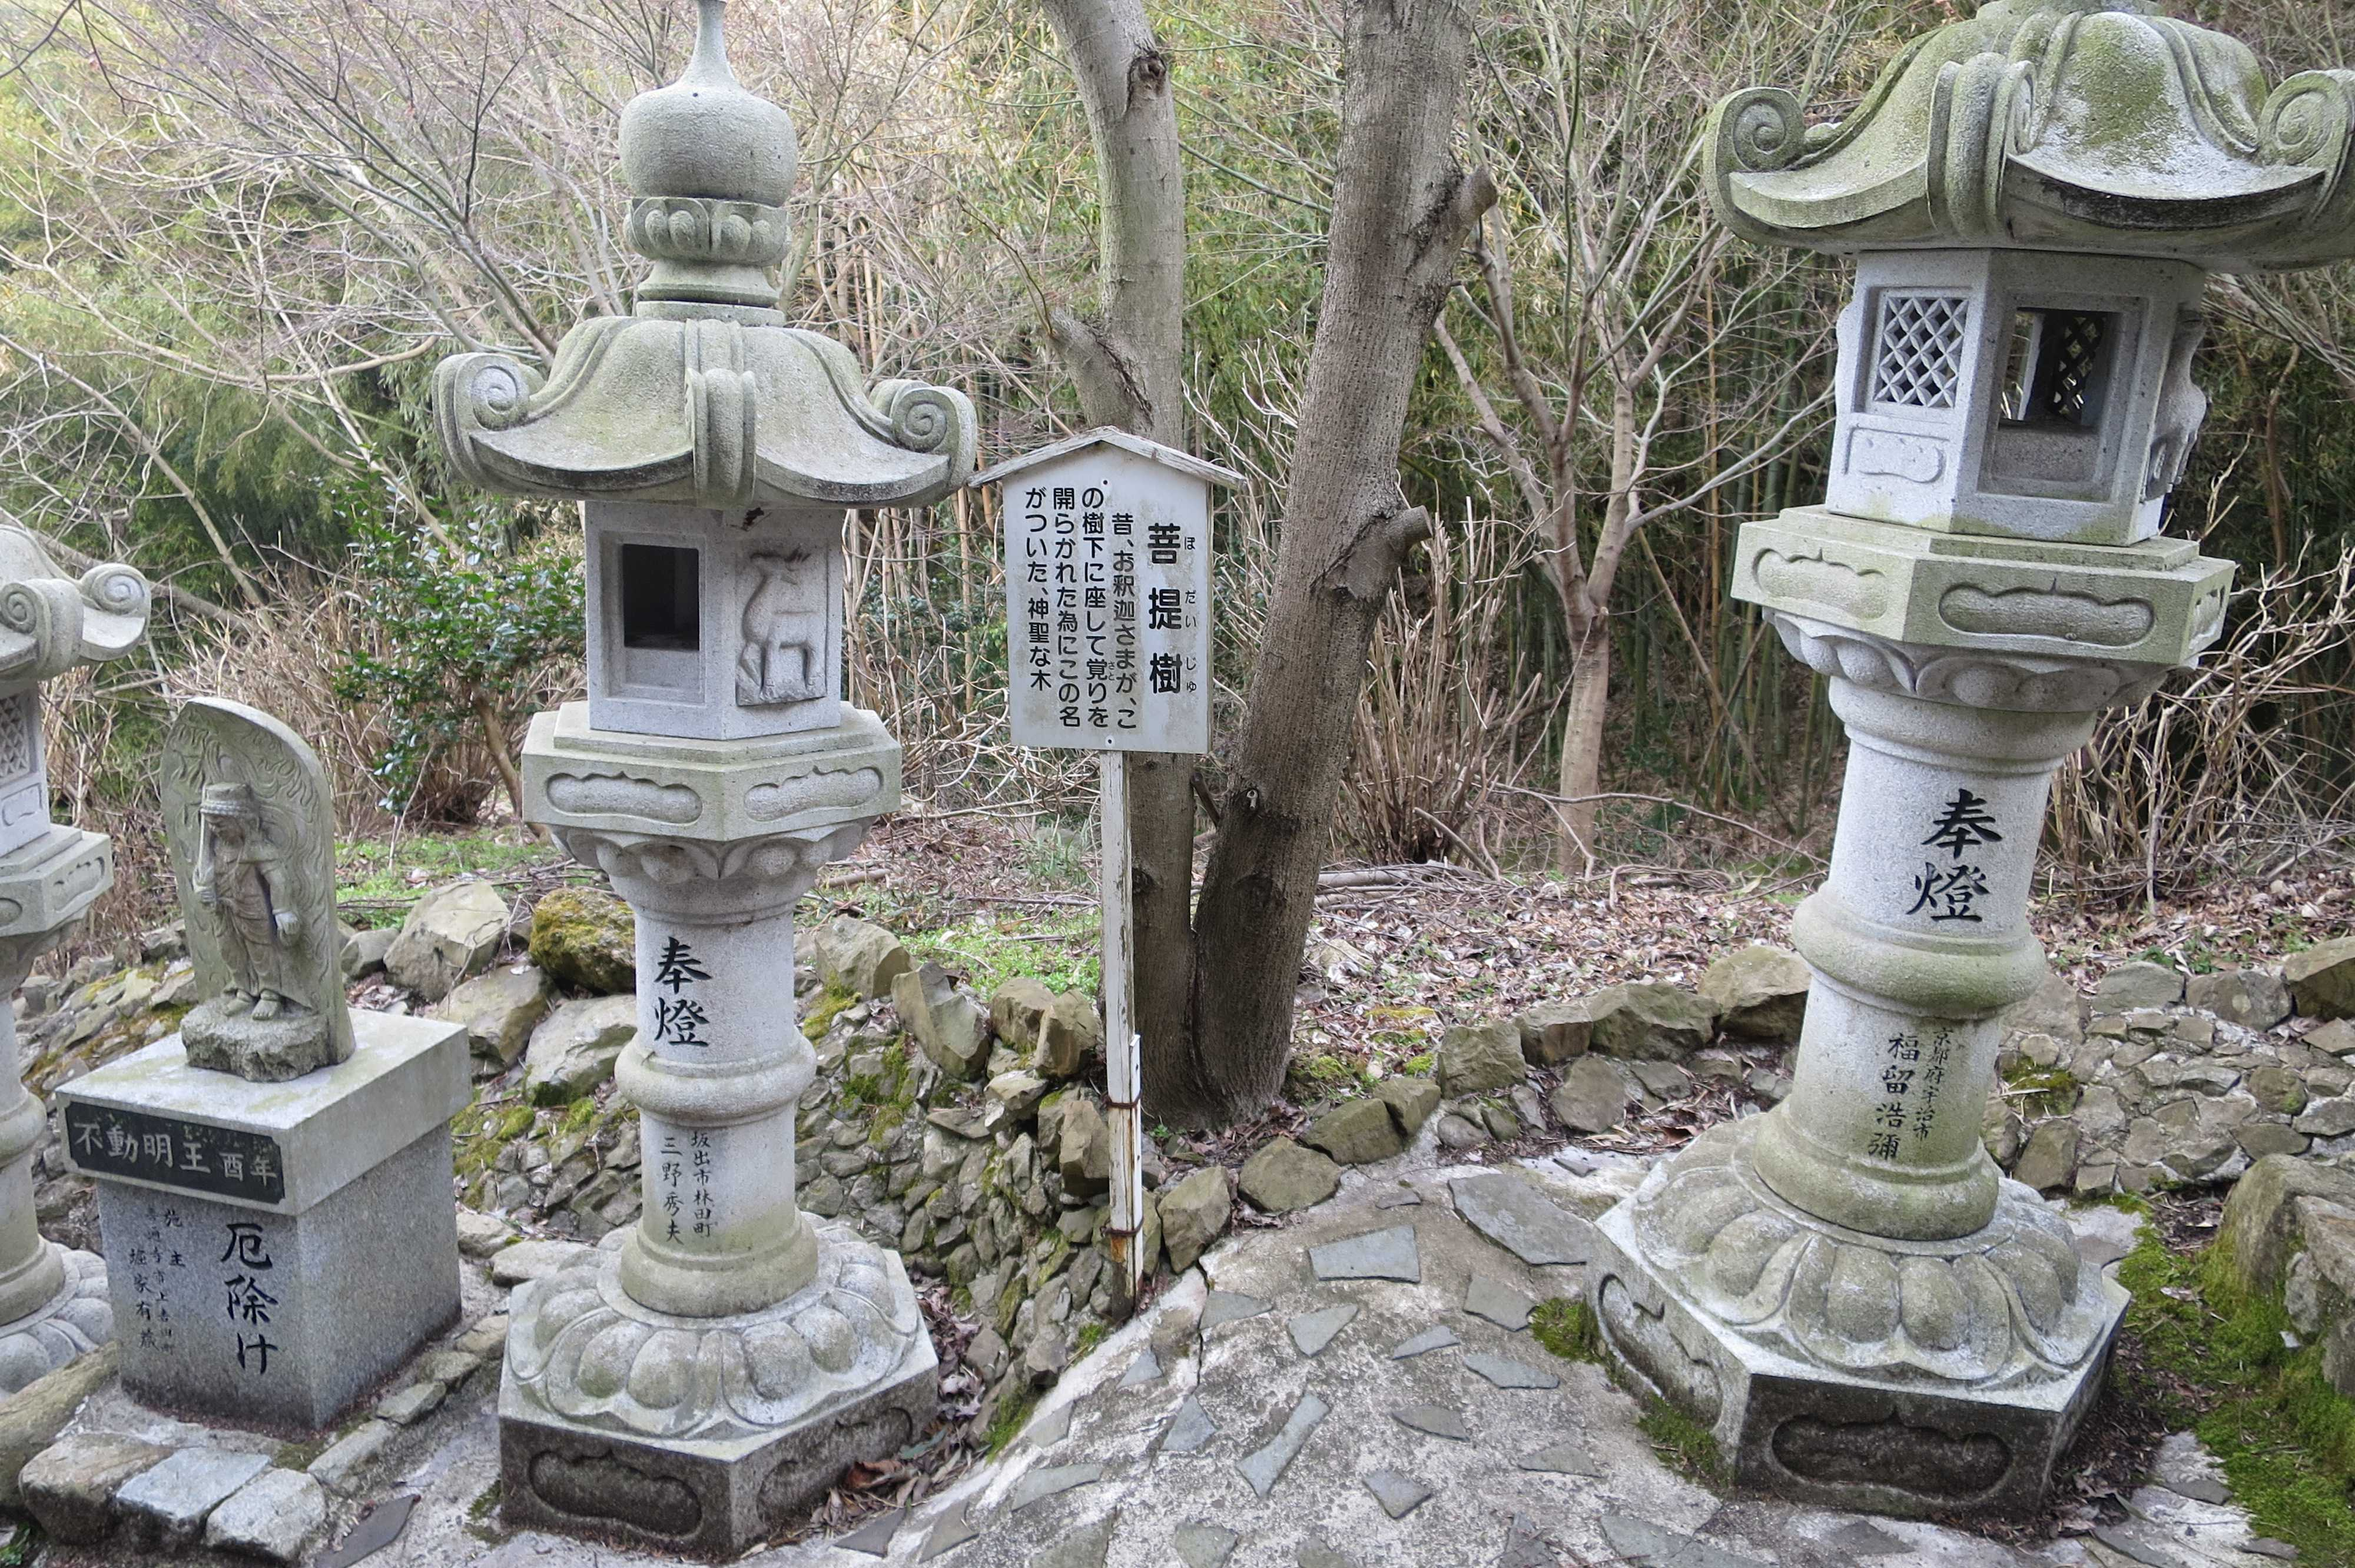 菩提樹 - 奥の院捨身ヶ嶽禅定